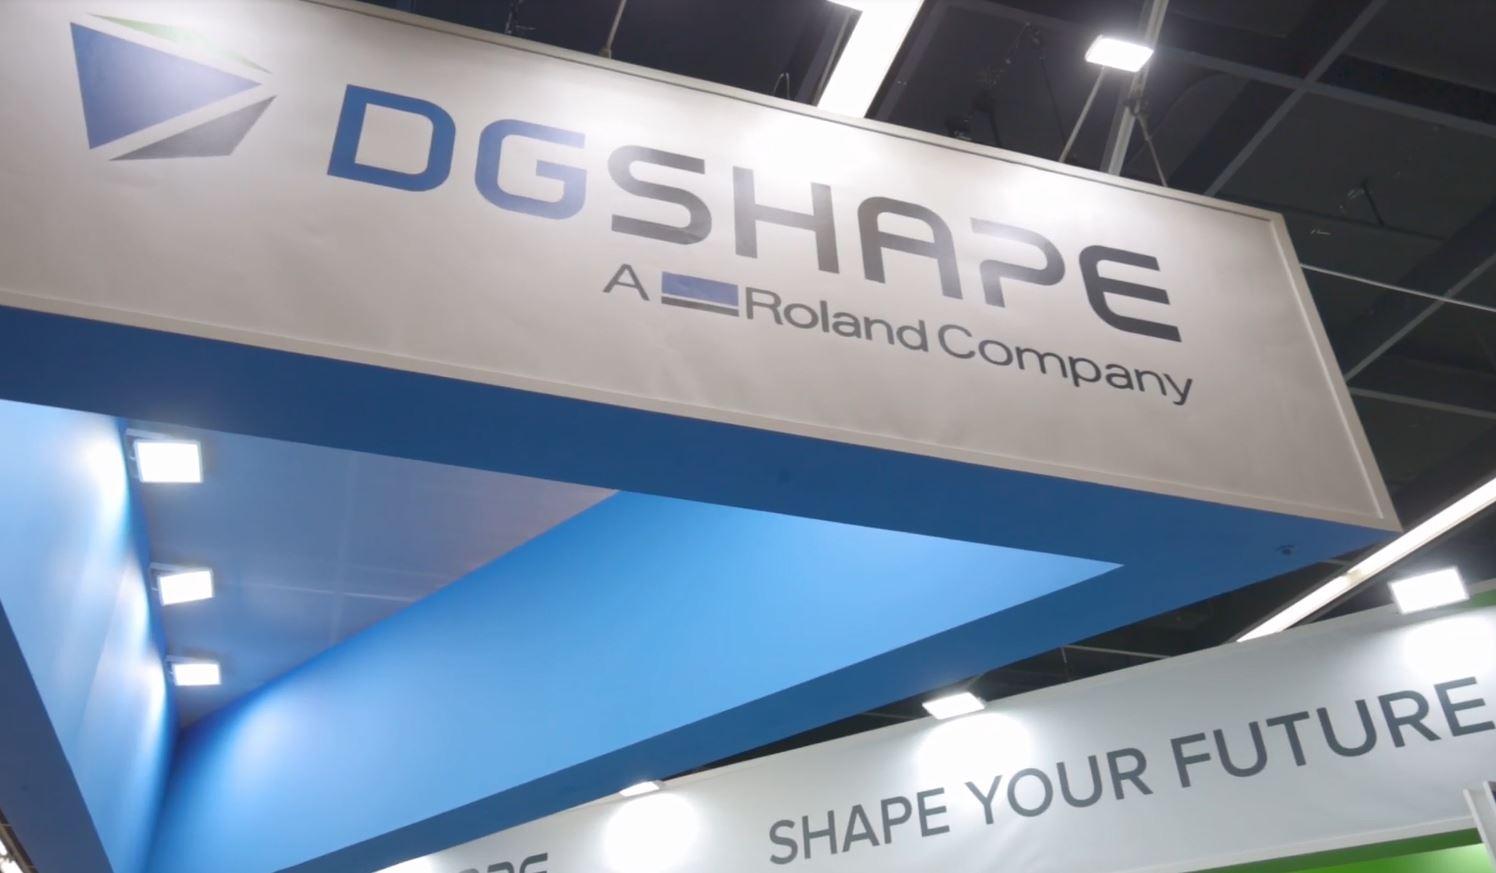 DGSHAPE at IDS 2019